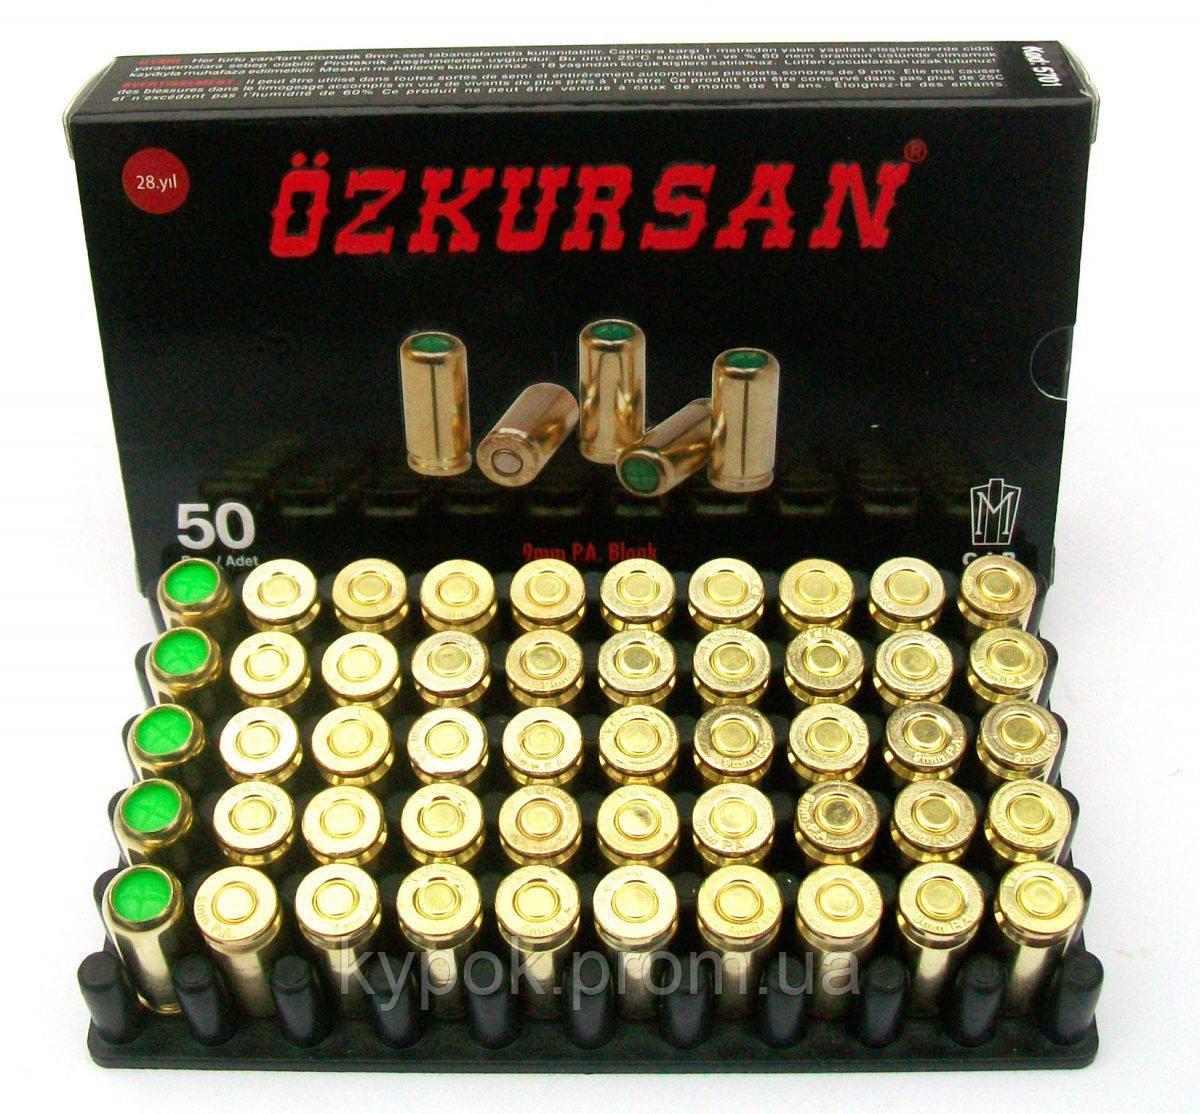 Патроны холостые Ozkursan 9 mm 50 шт